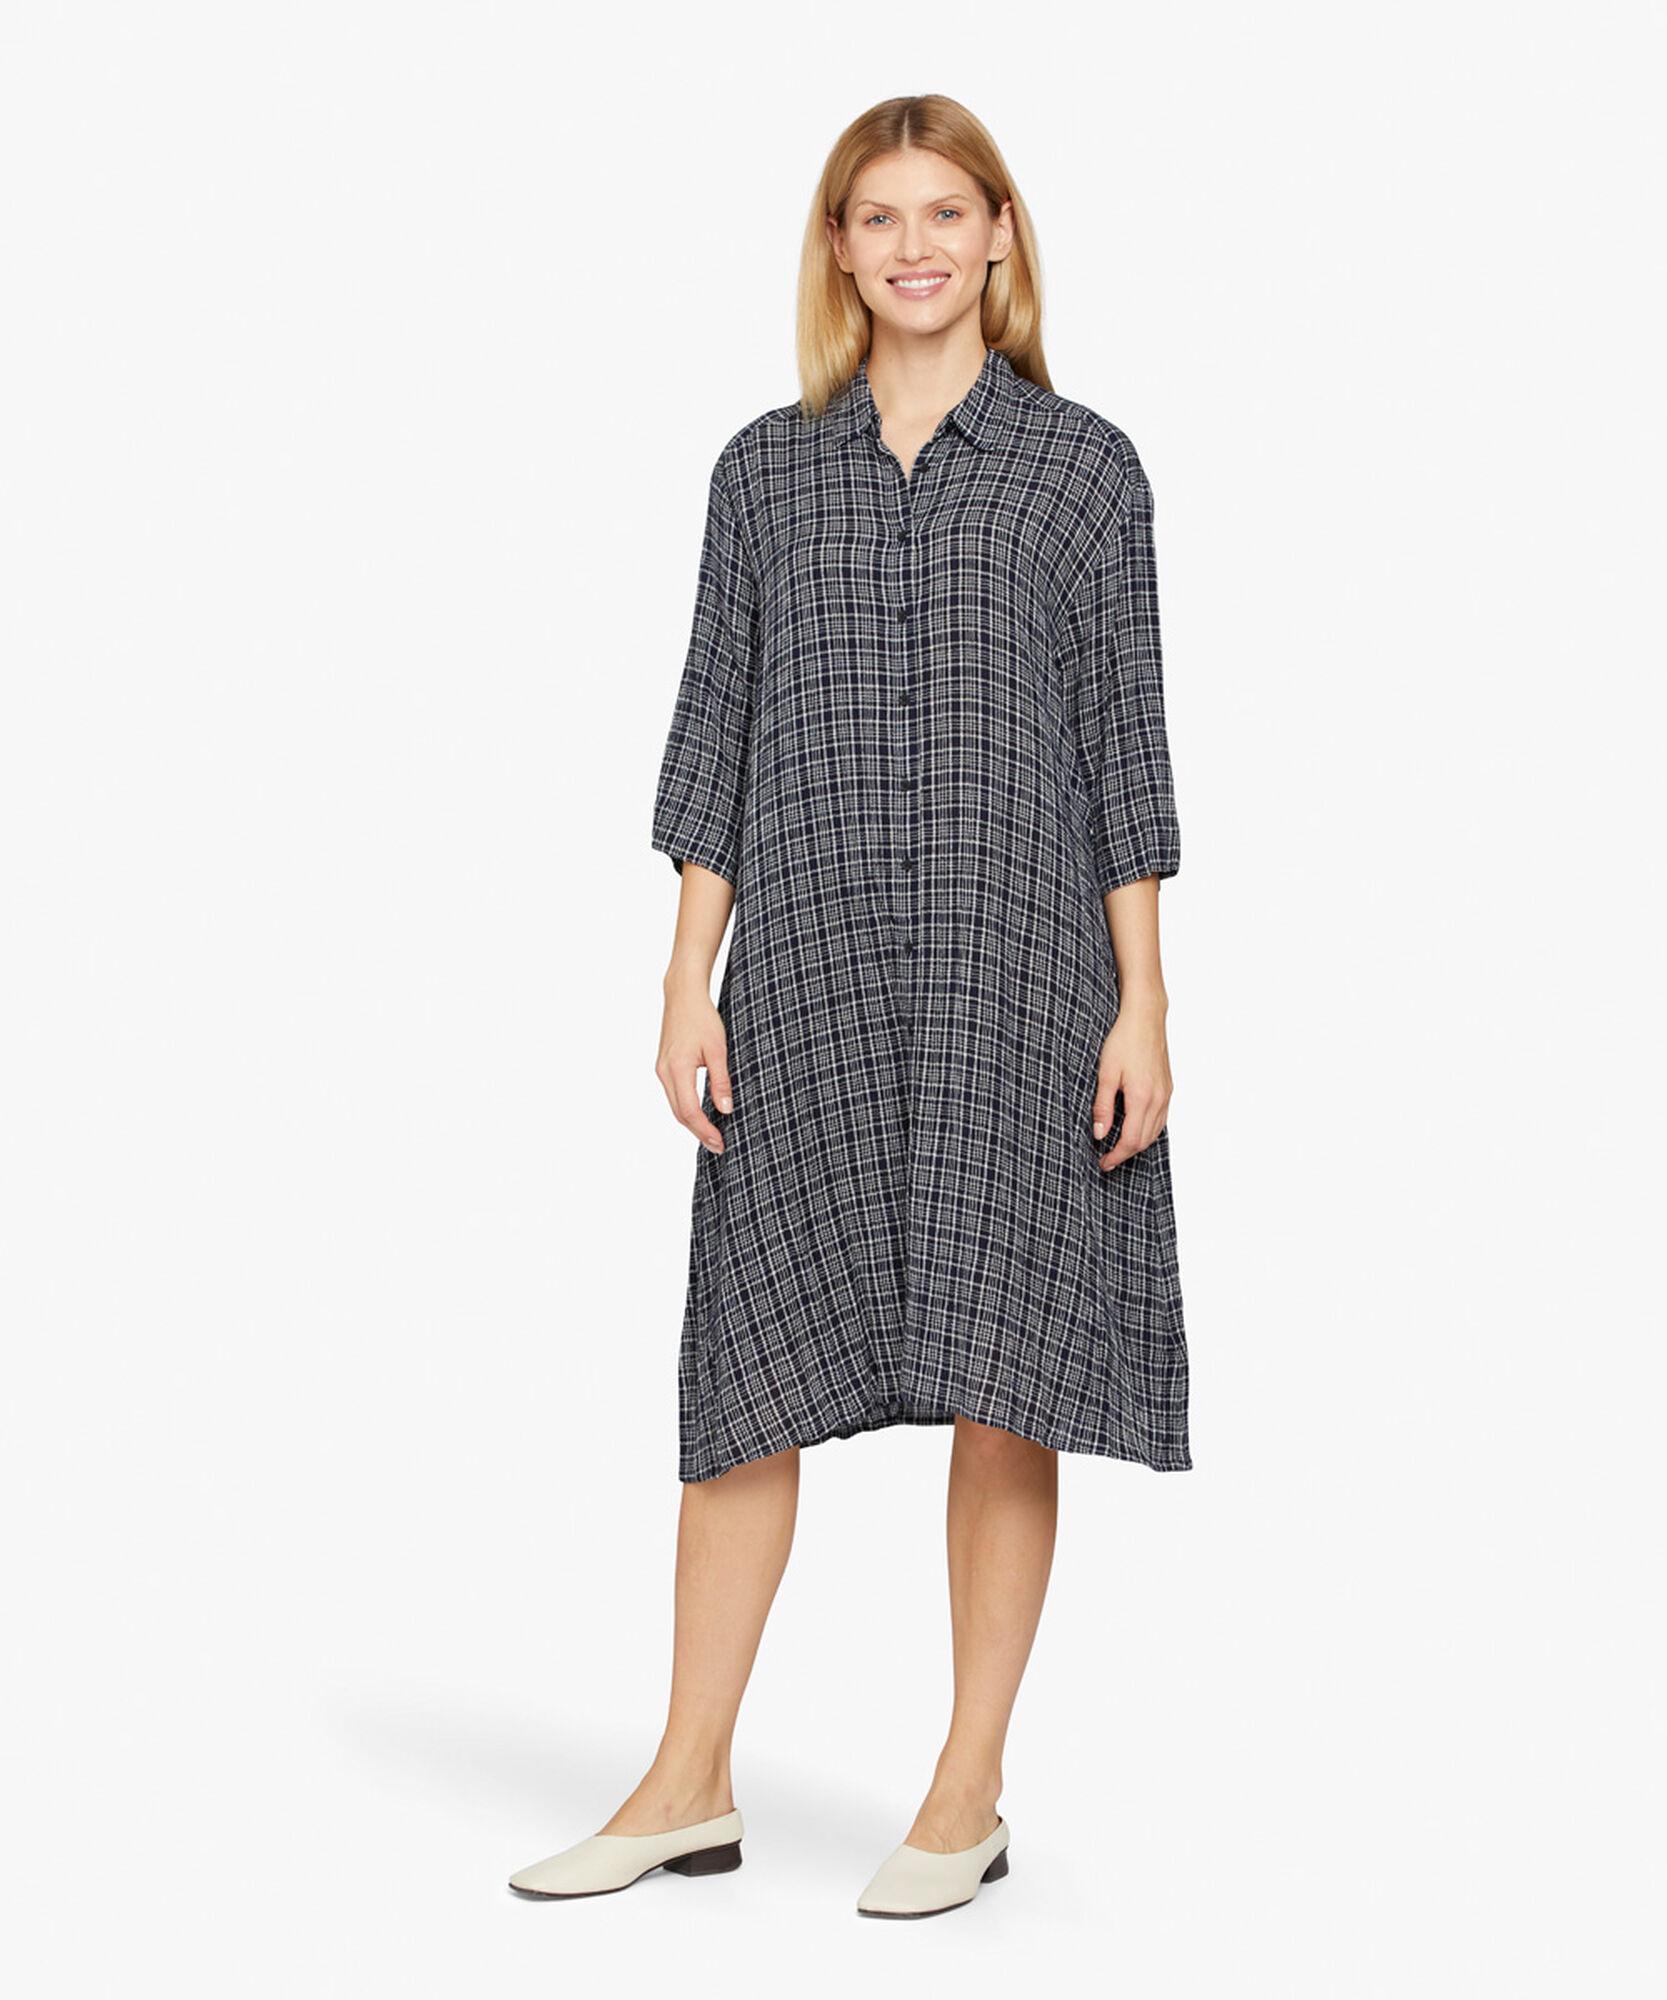 NANCYL SHIRT DRESS, Navy, hi-res